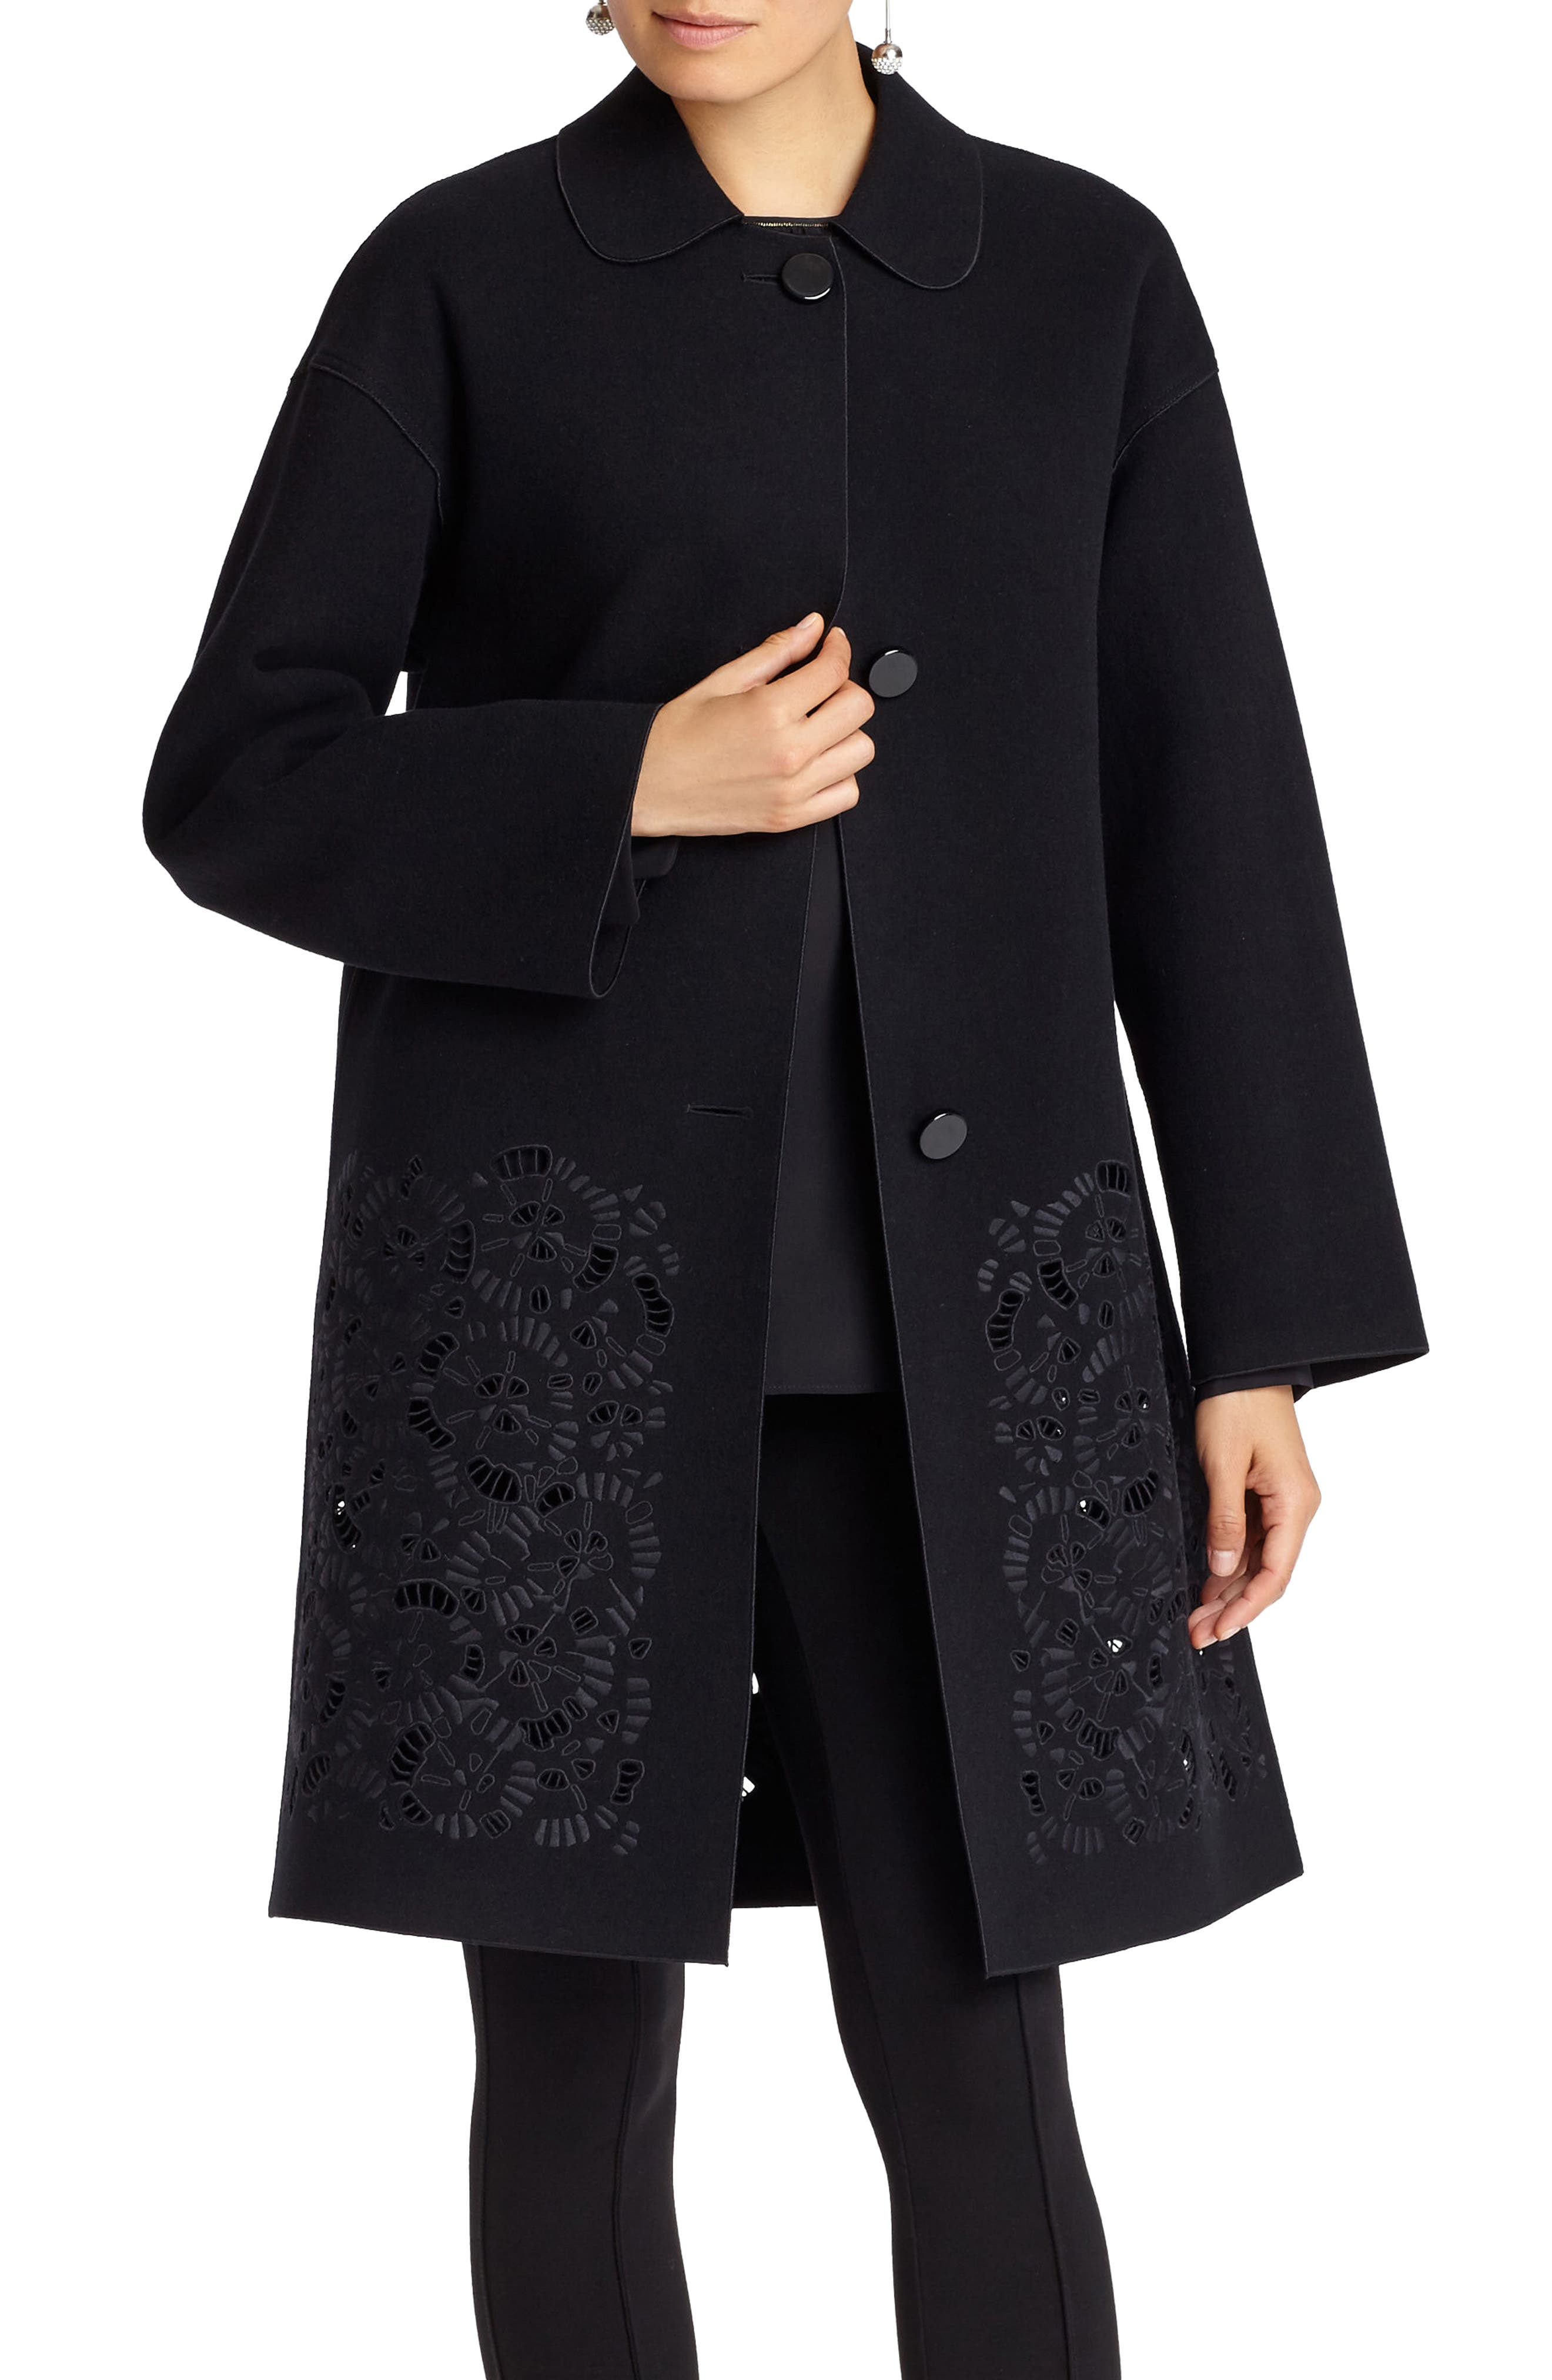 Alternate Image 1 Selected - Lafayette 148 New York Vita Laser Cut Embroidered Coat